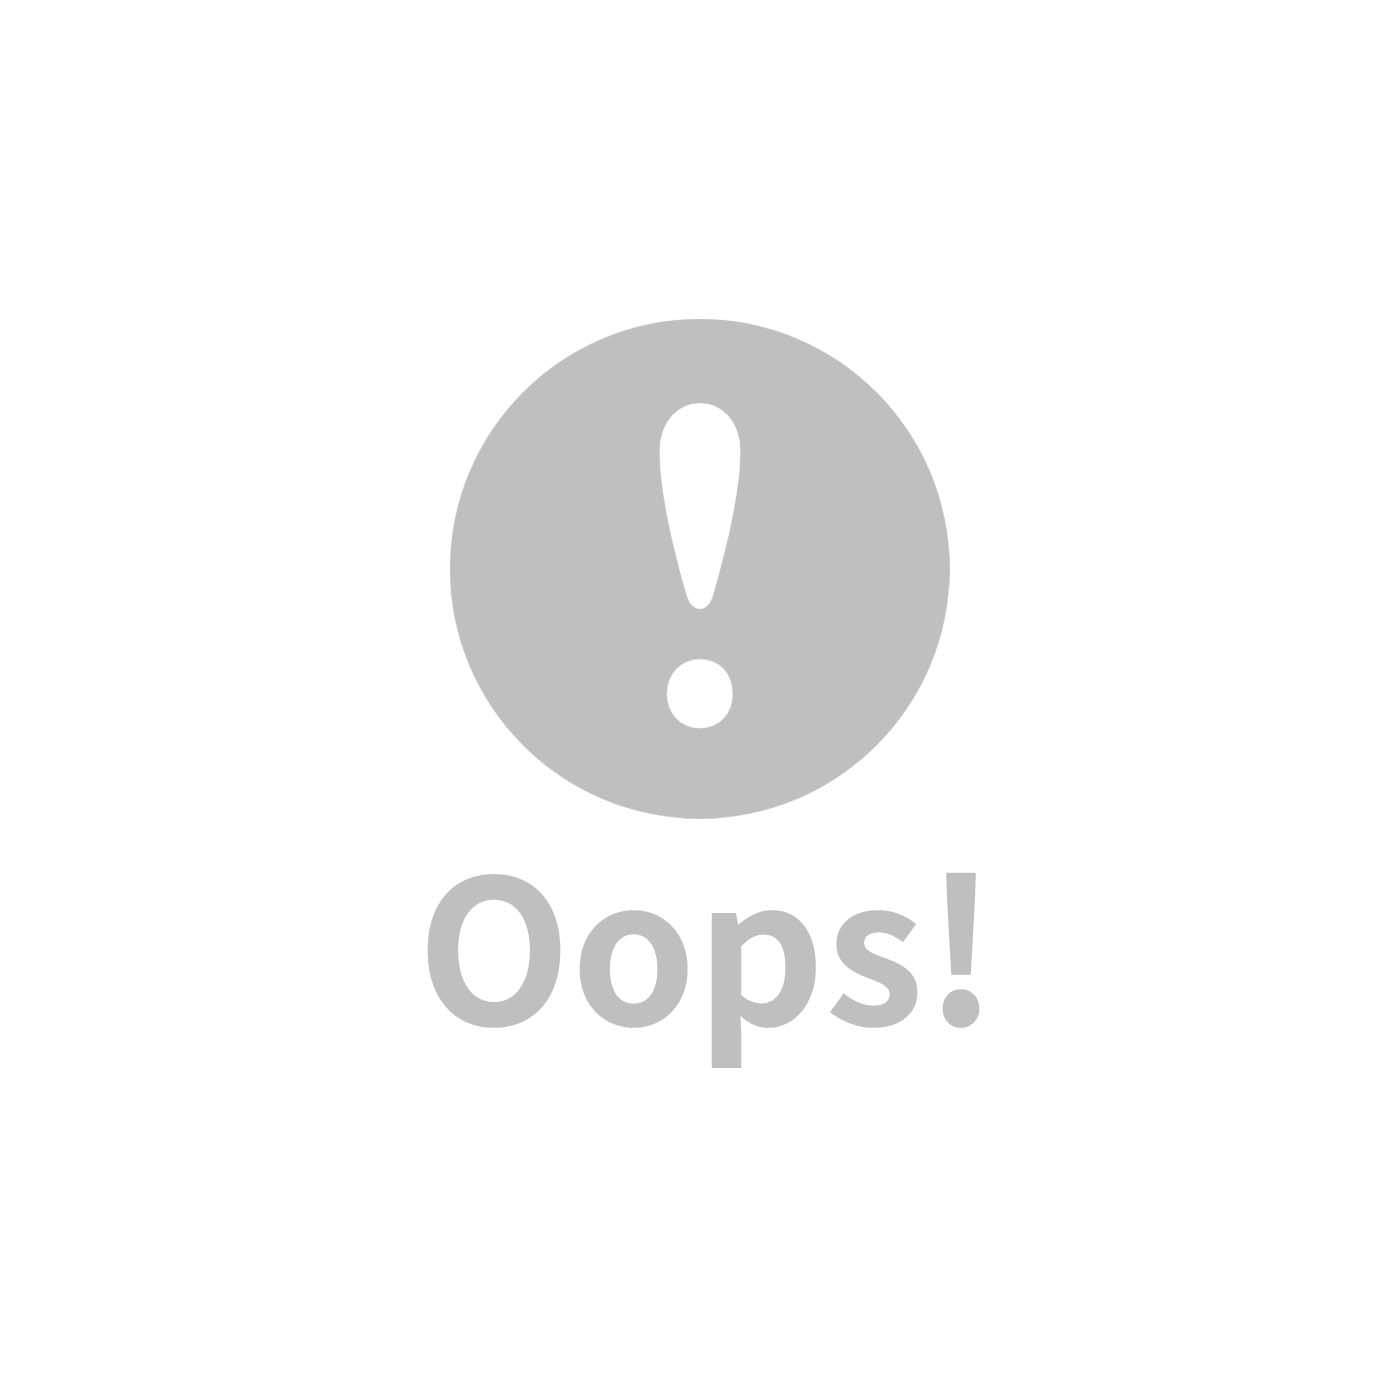 La Millou Jersey時尚篷篷浴巾_標準0-2Y- 大力水手(雲朵白)